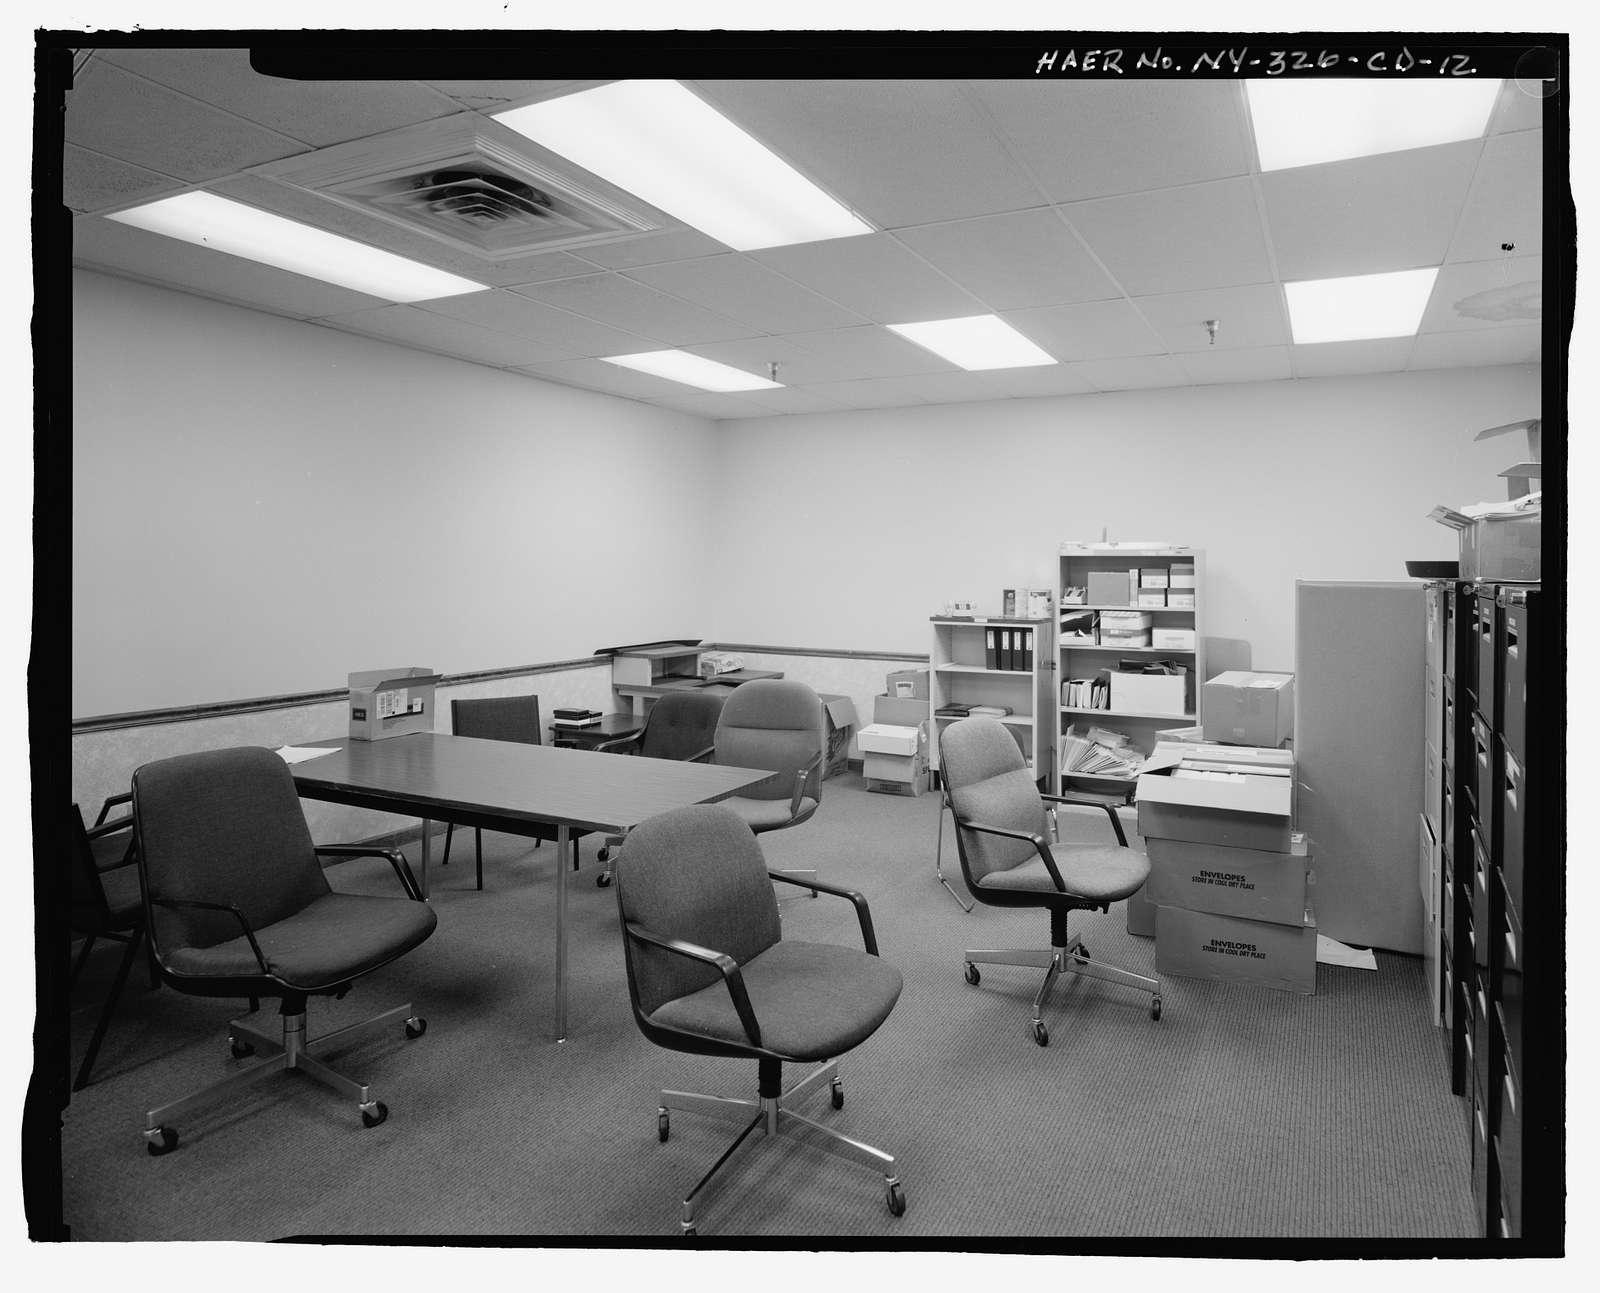 Plattsburgh Air Force Base, Flight Simulator Training Building, Arizona Avenue, Plattsburgh, Clinton County, NY